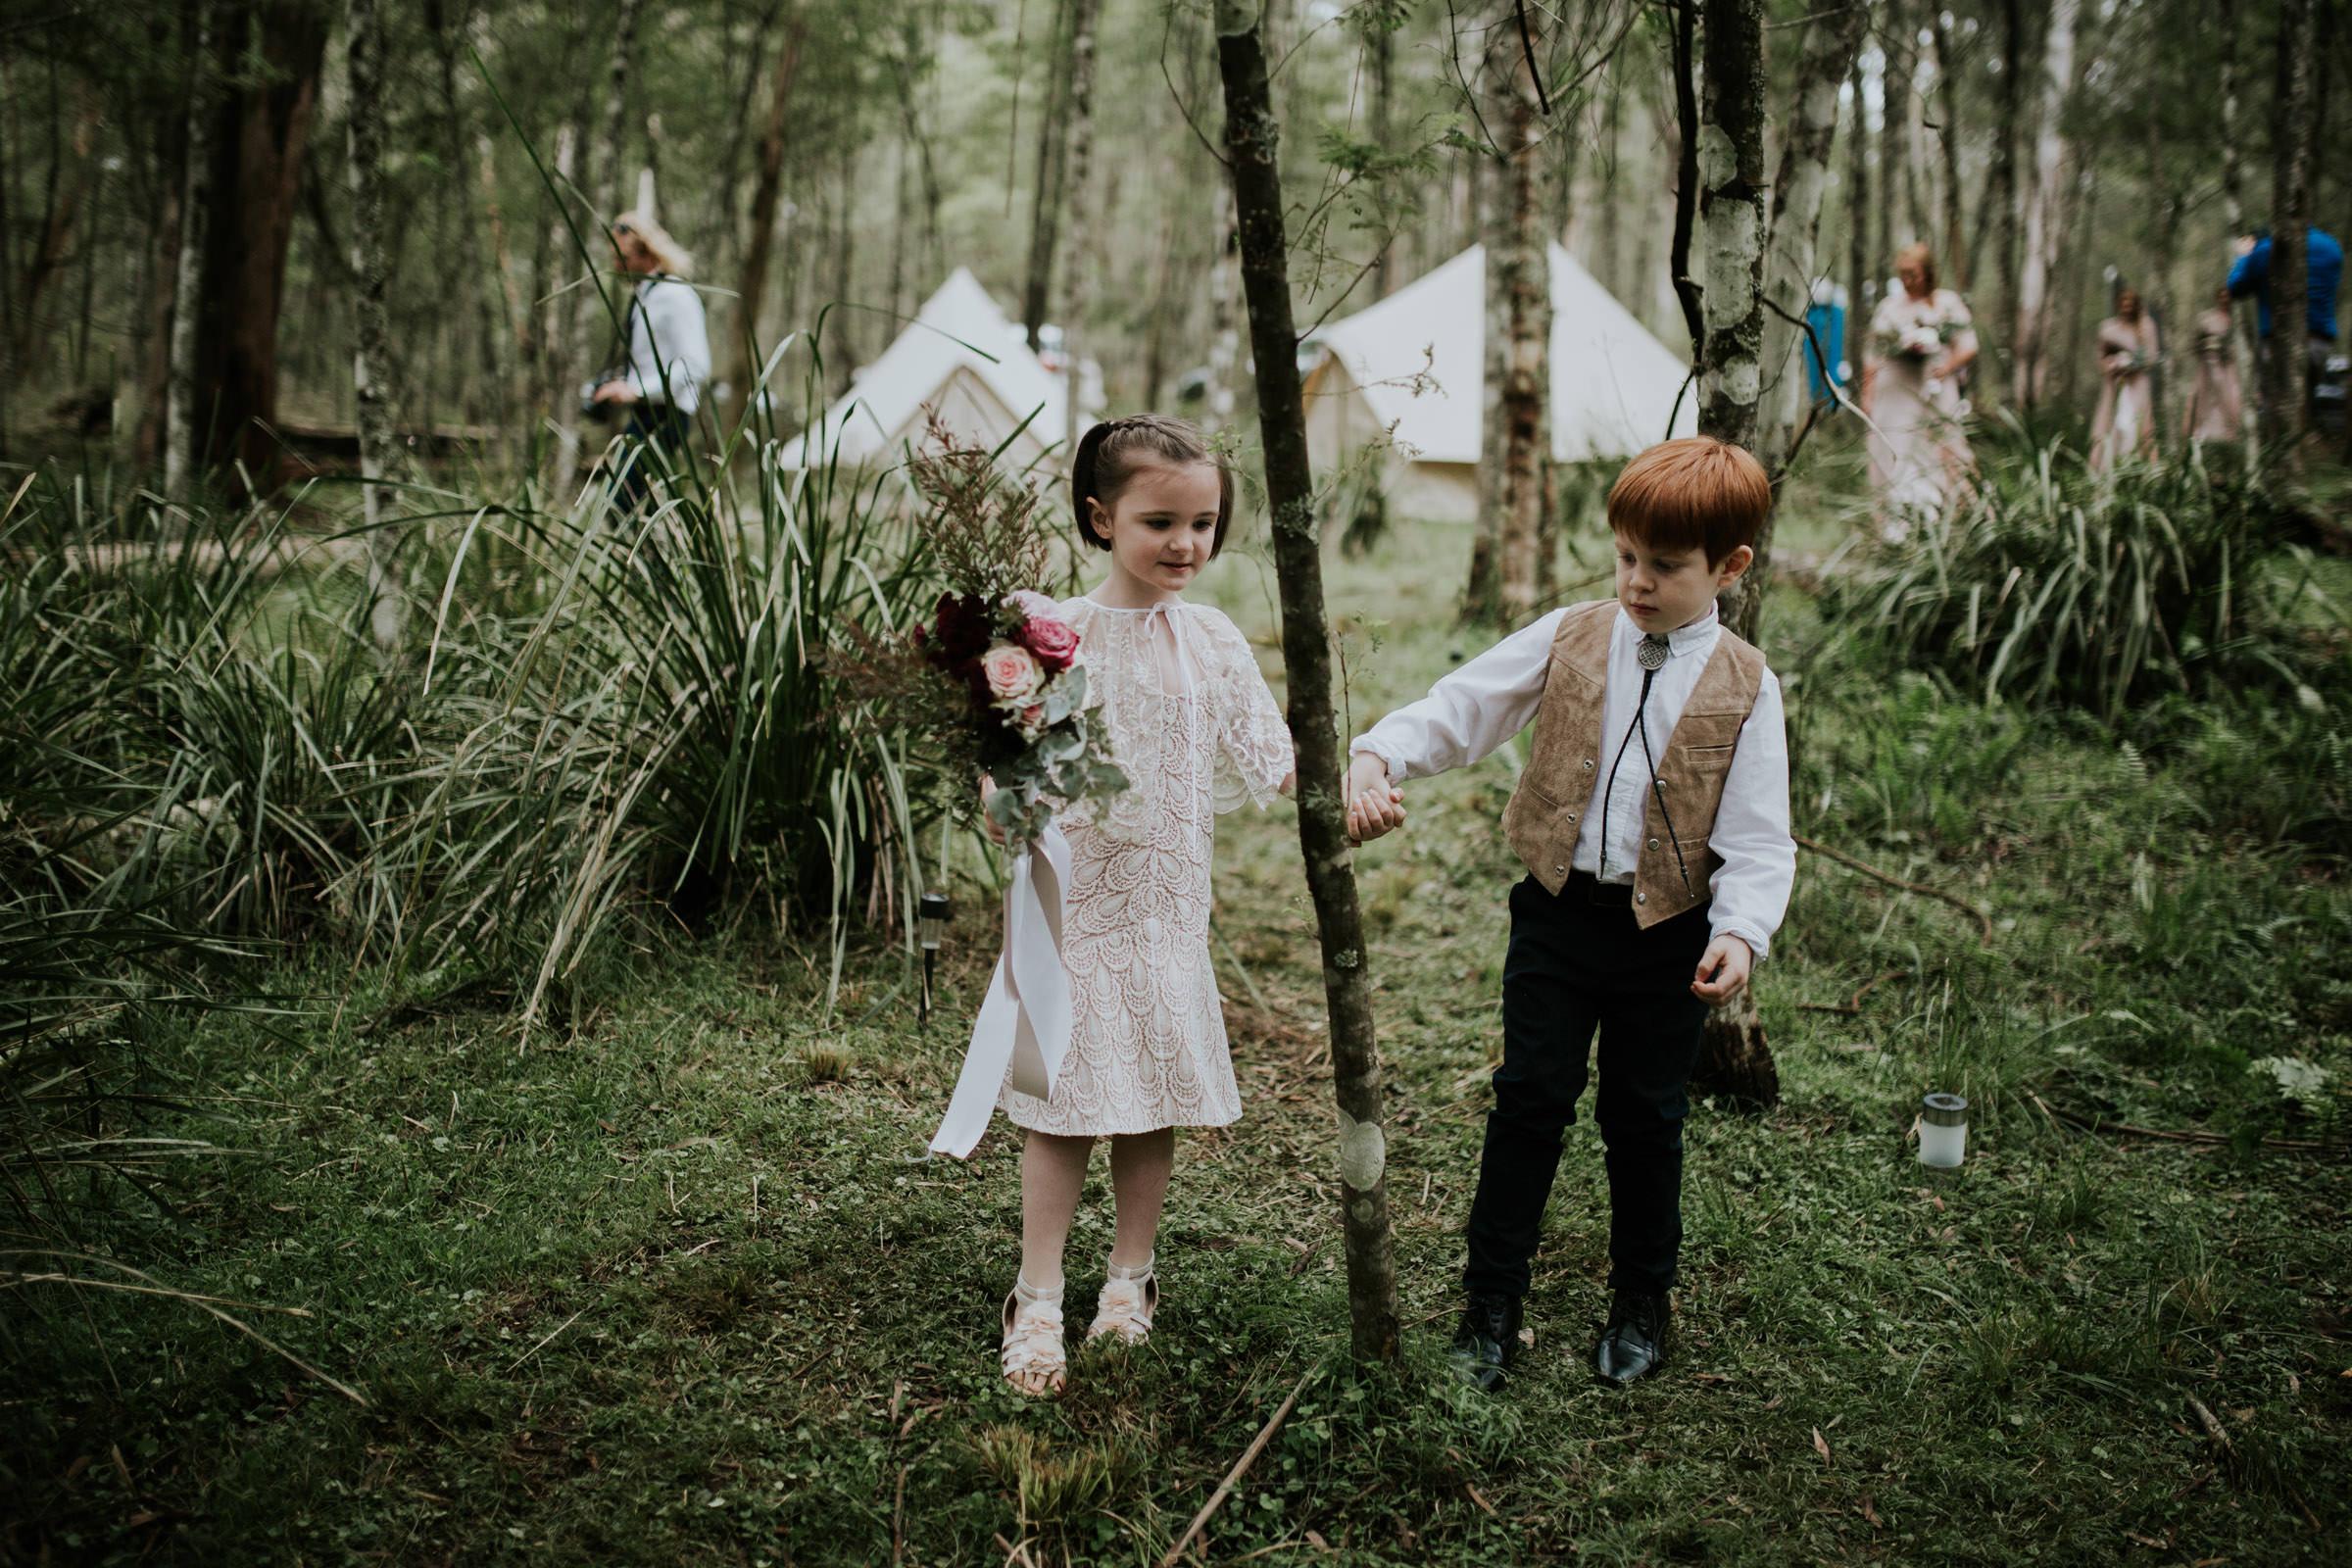 Emma+John+Far+South+Coast+Wedding+Festivl+Glamping+Bush-87.jpg